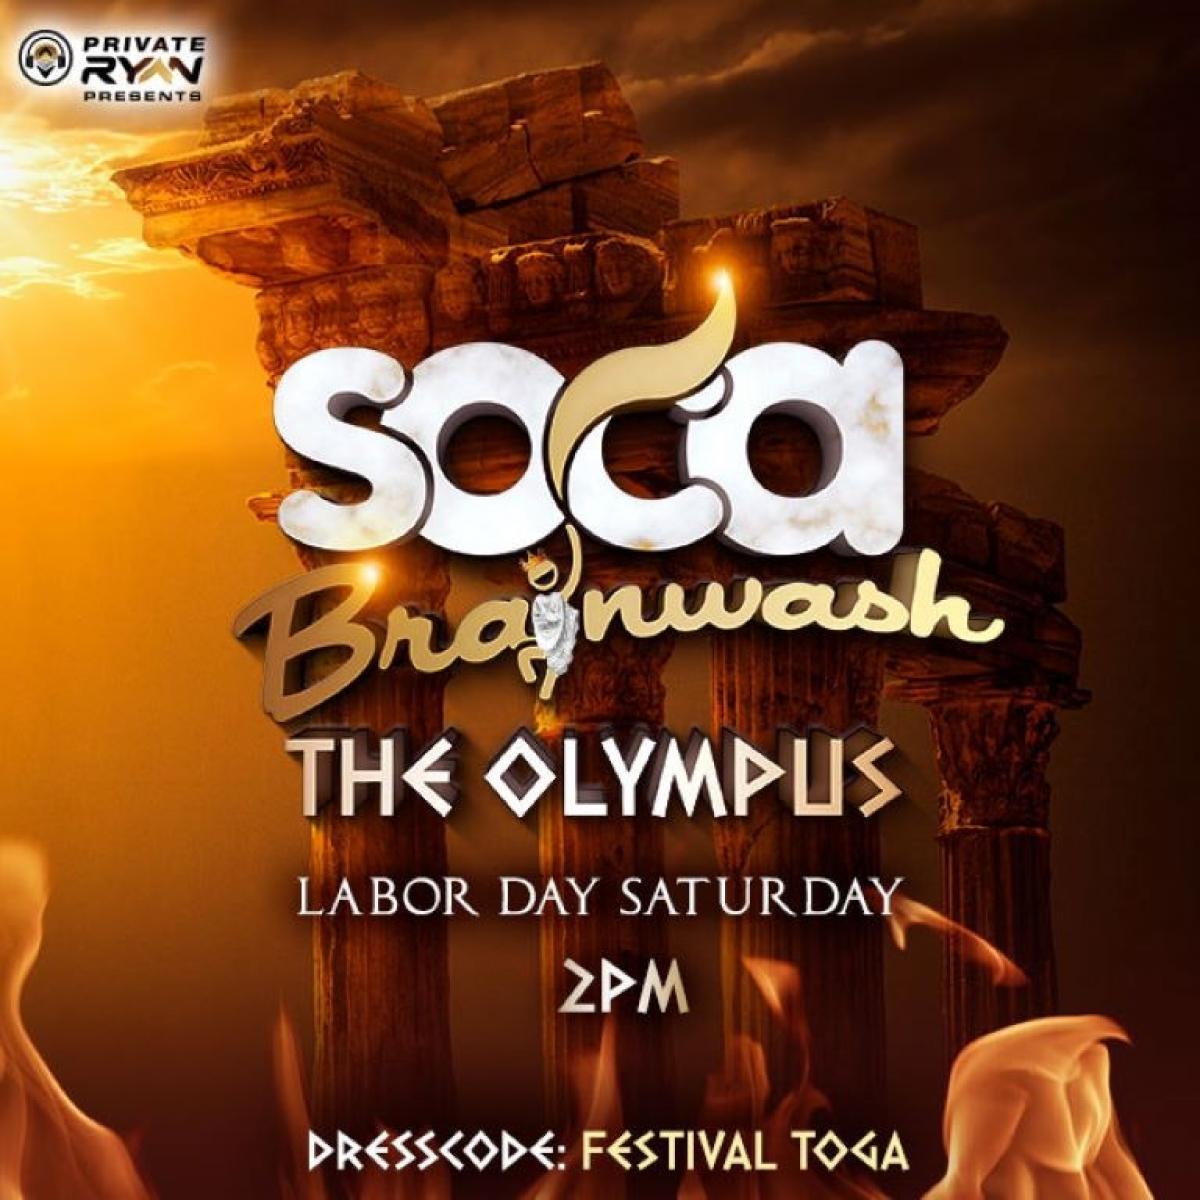 Soca Brainwash: The Olympus flyer or graphic.